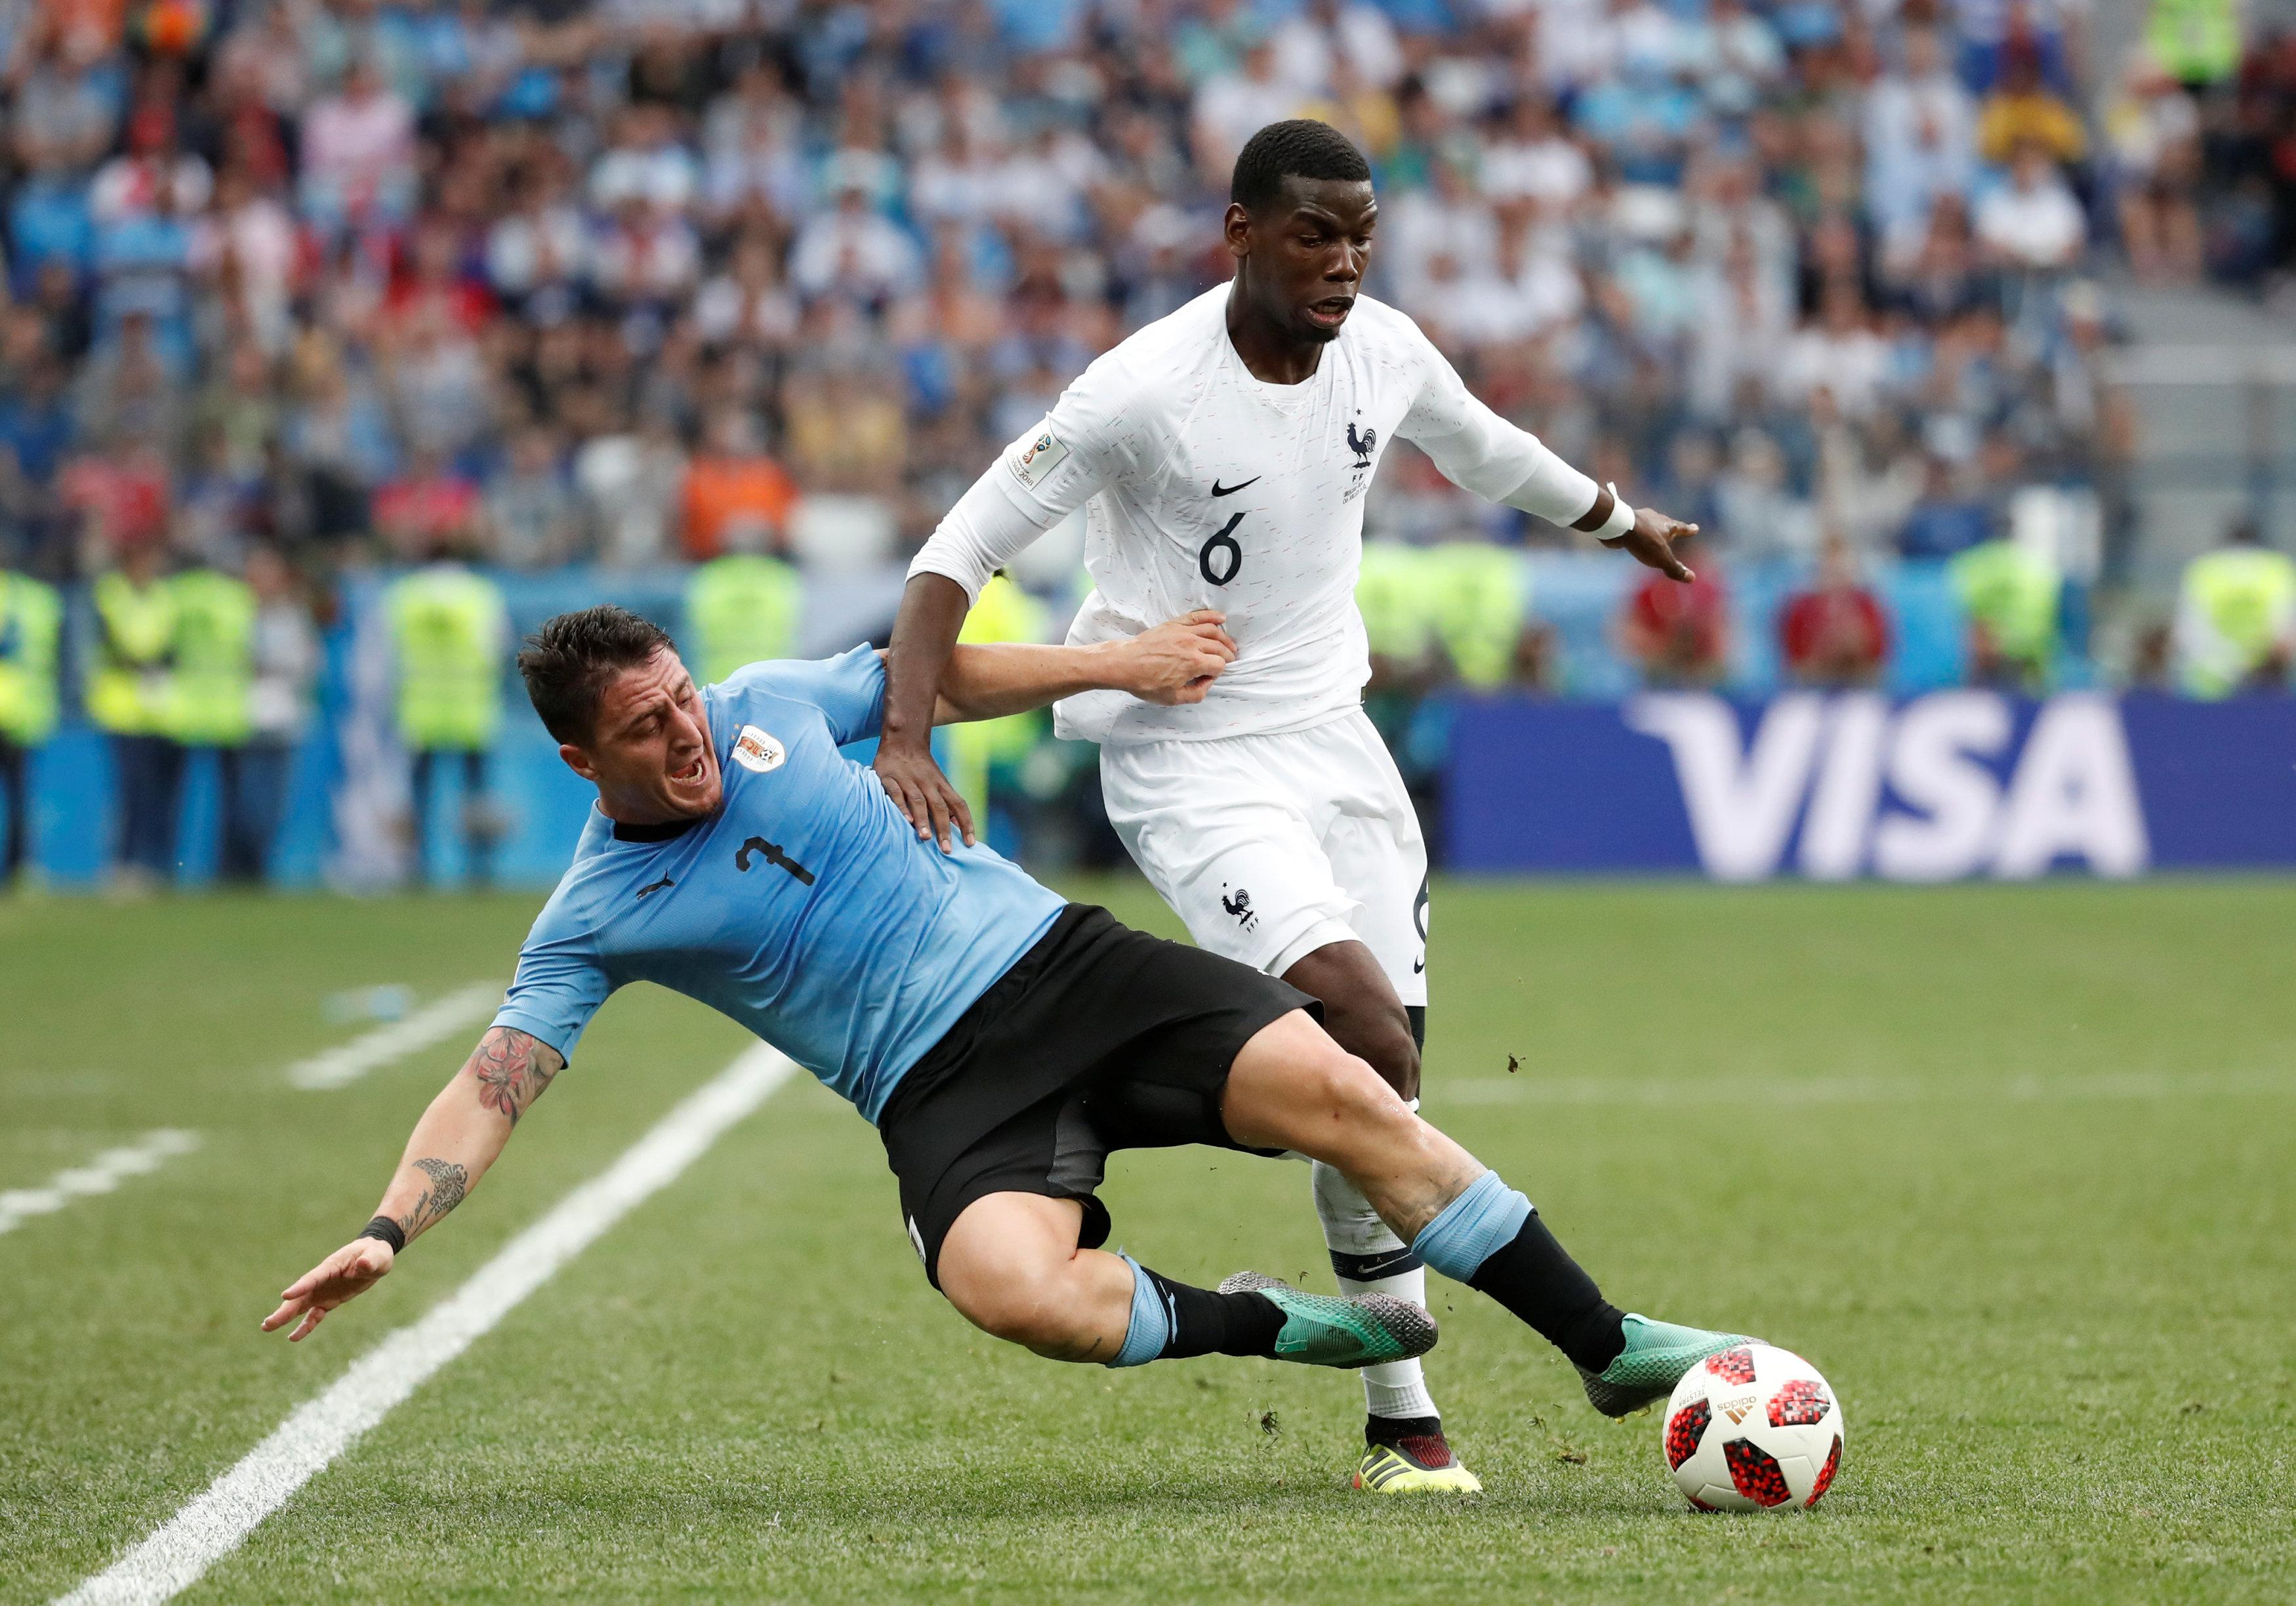 Francebeat Uruguay 2-0 to reach semi-finals